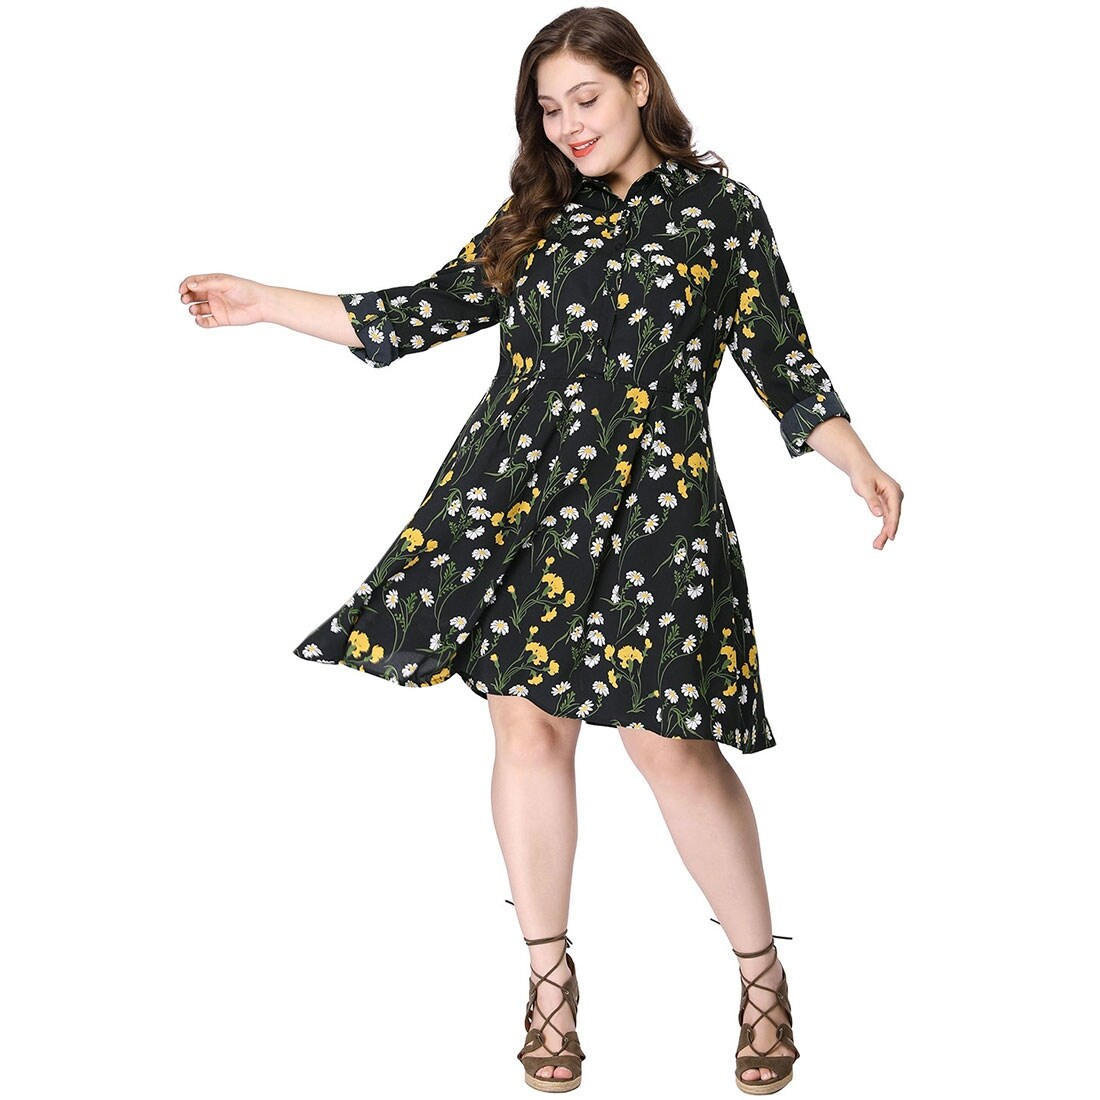 Women\'s Plus Size Knee Length Flared Floral Print Shirt Dress - Black